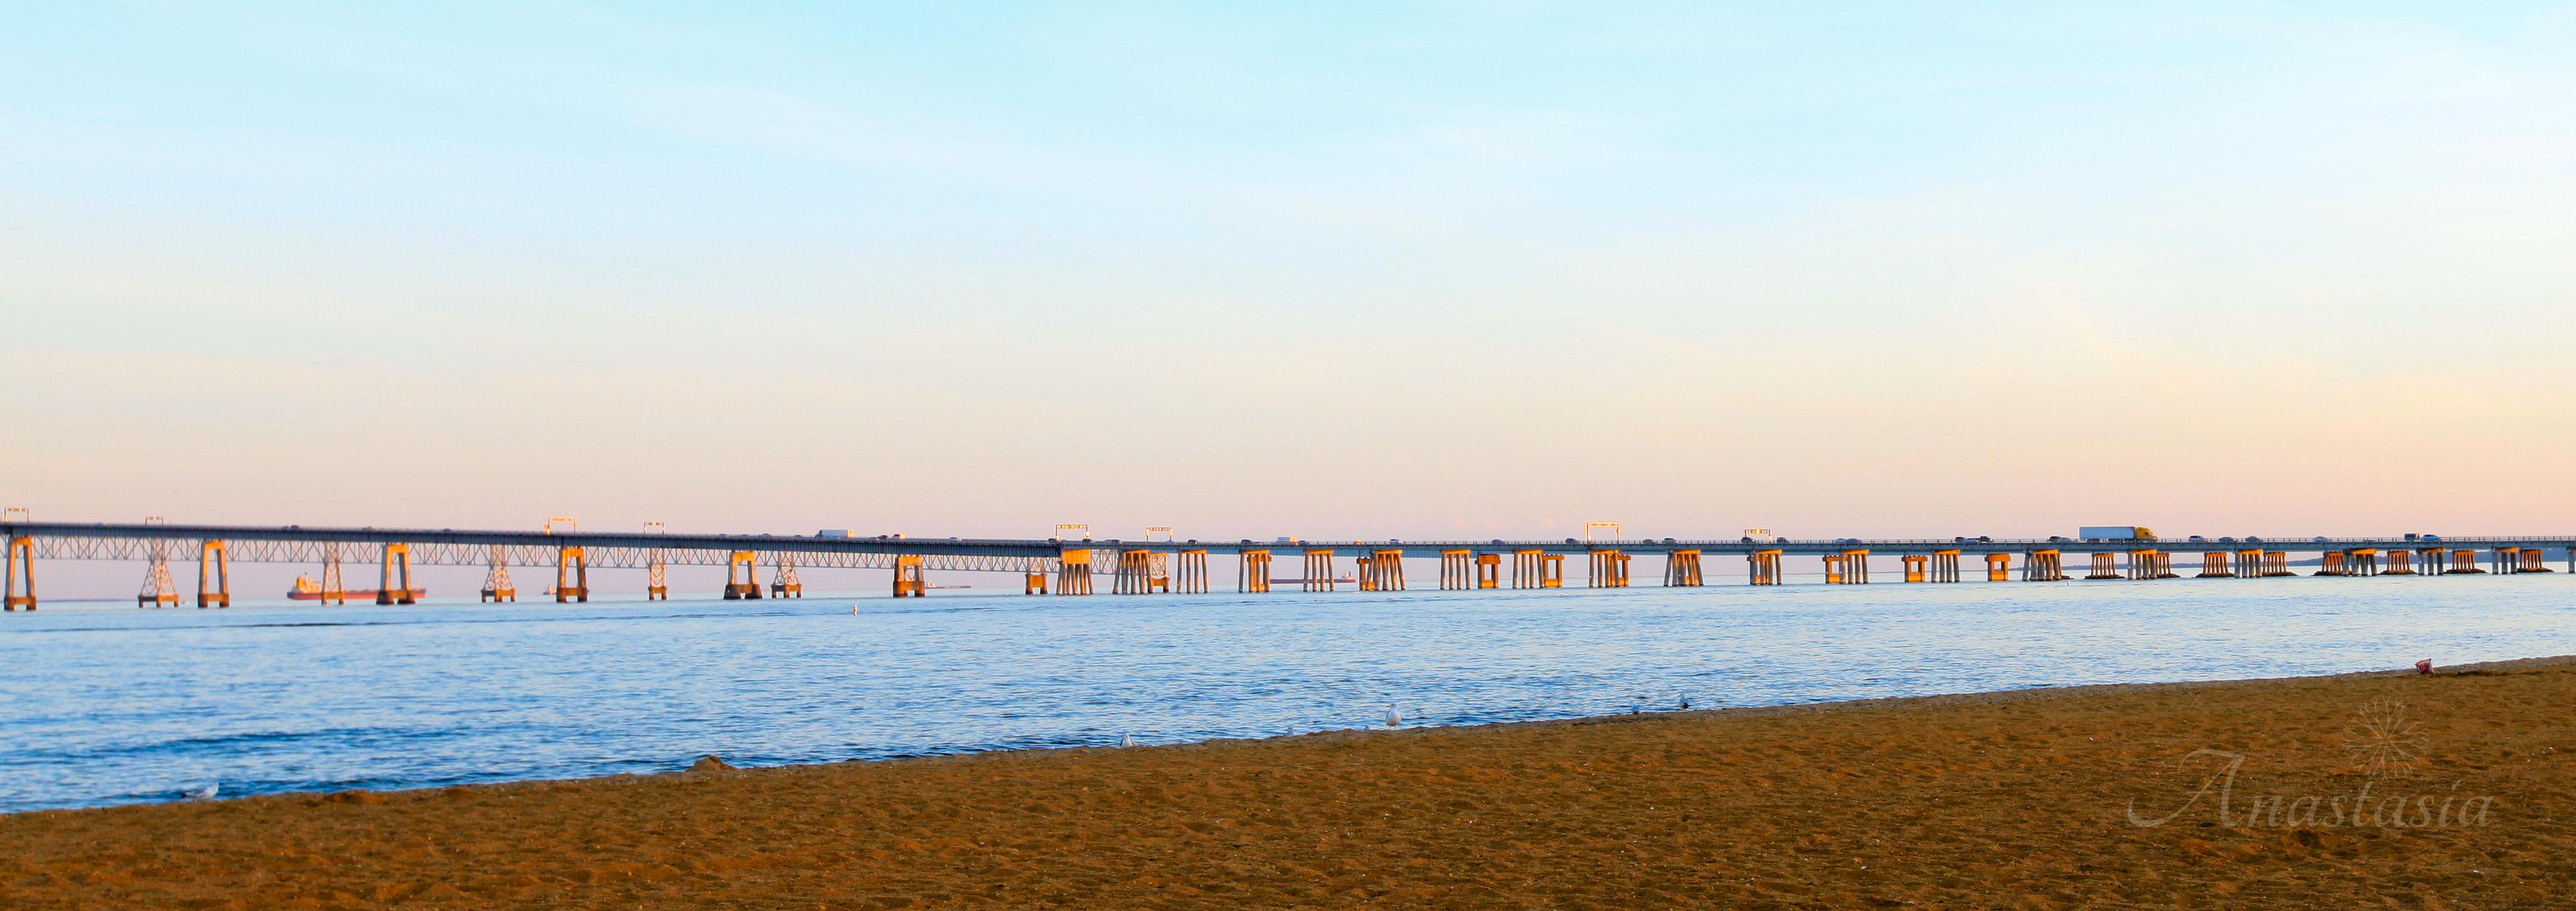 Bay bridge Maryland